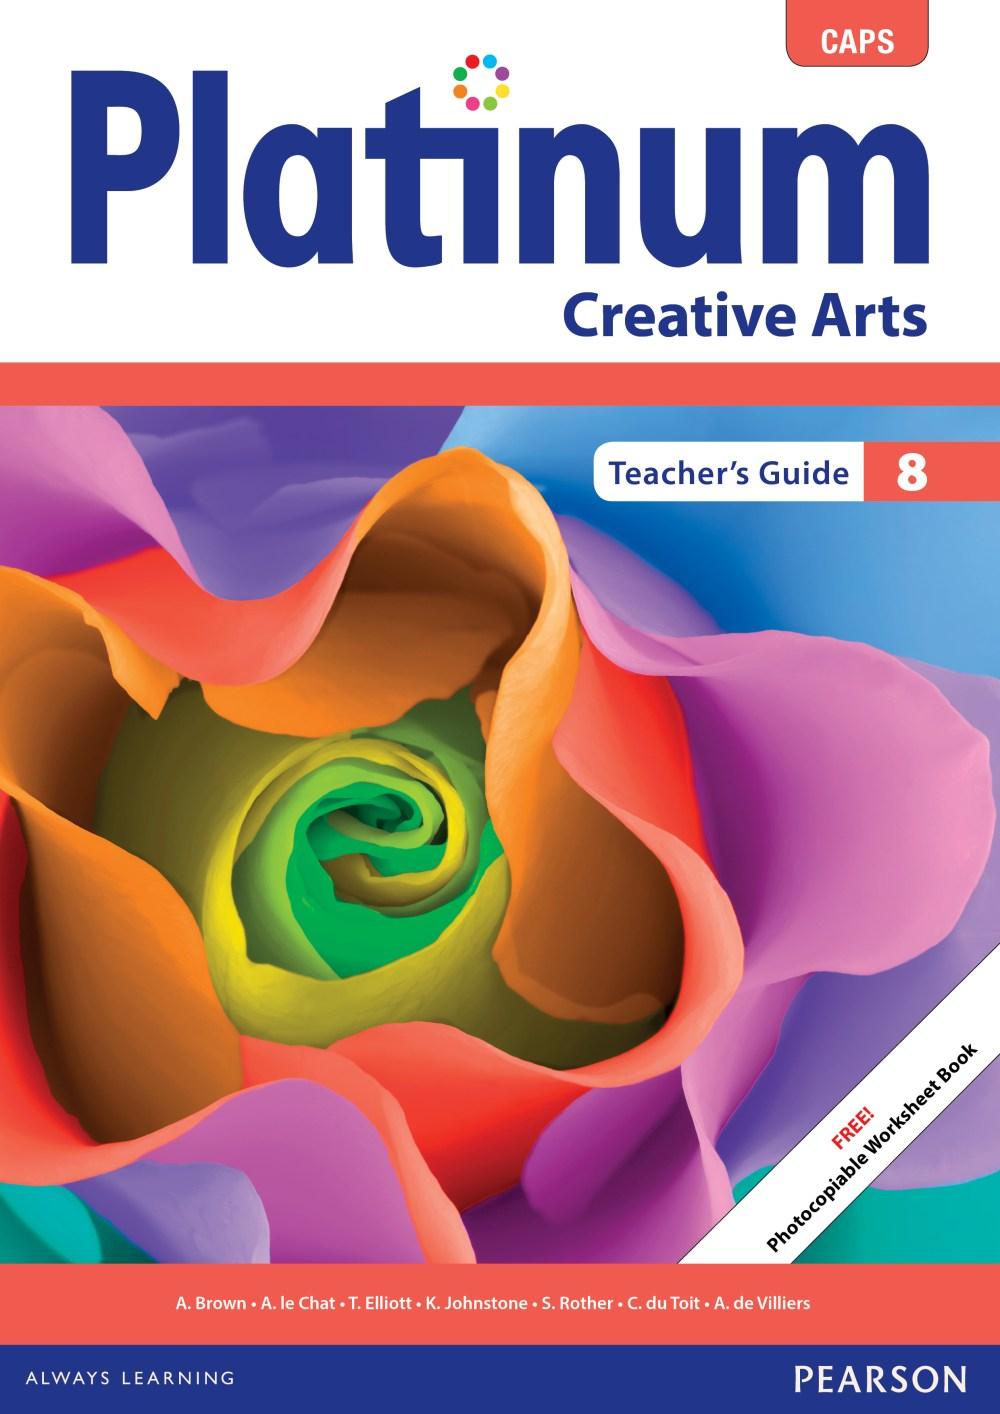 medium resolution of Platinum Creative Arts Grade 8 Teacher's Guide ePDF (perpetual licence)    WCED ePortal